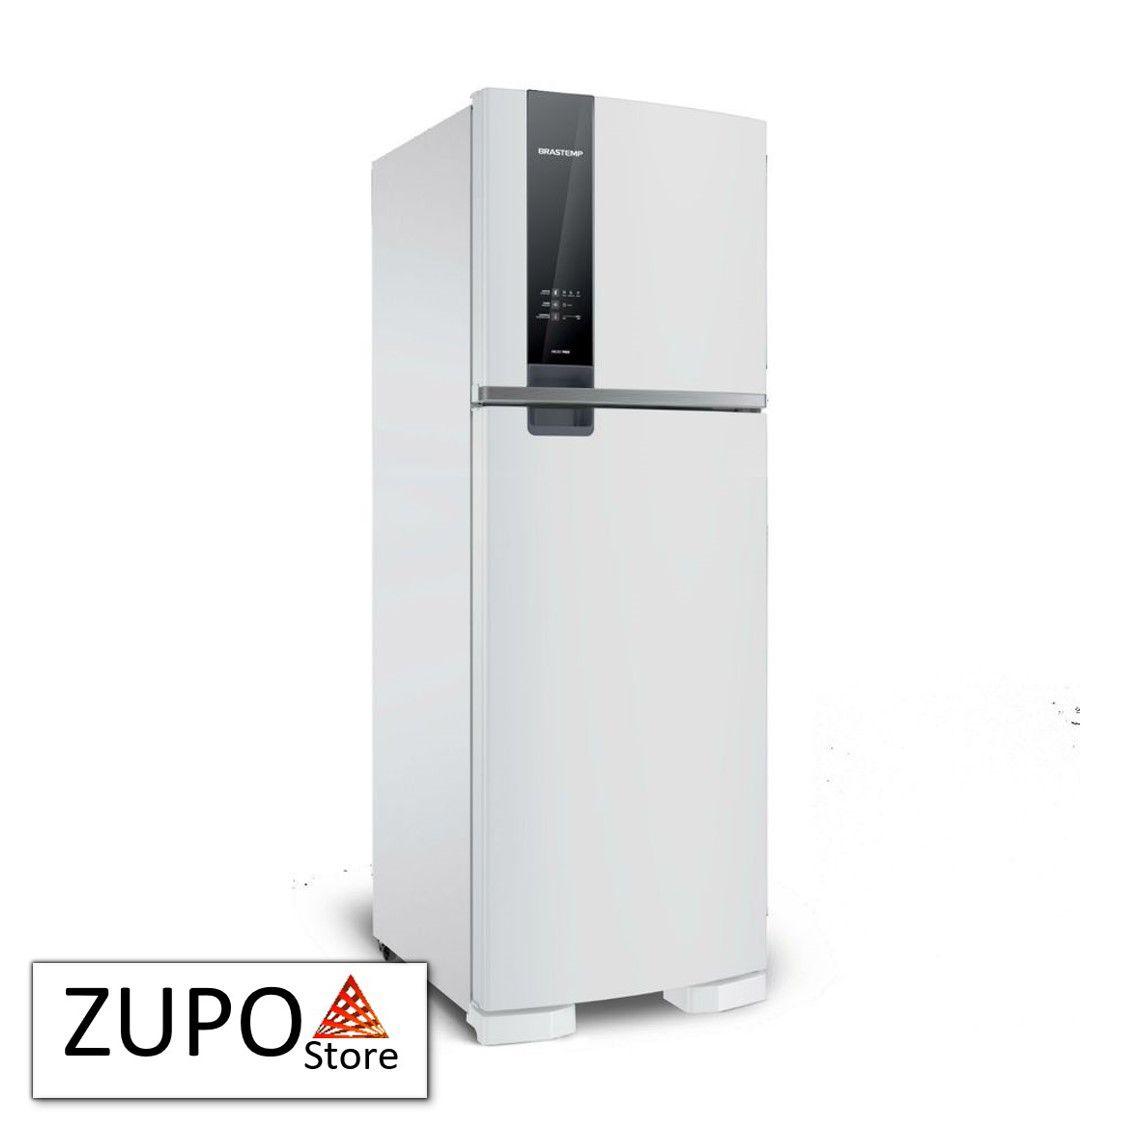 Refrigerador Brastemp 375 Litros Branco - BRM45HB - 127V